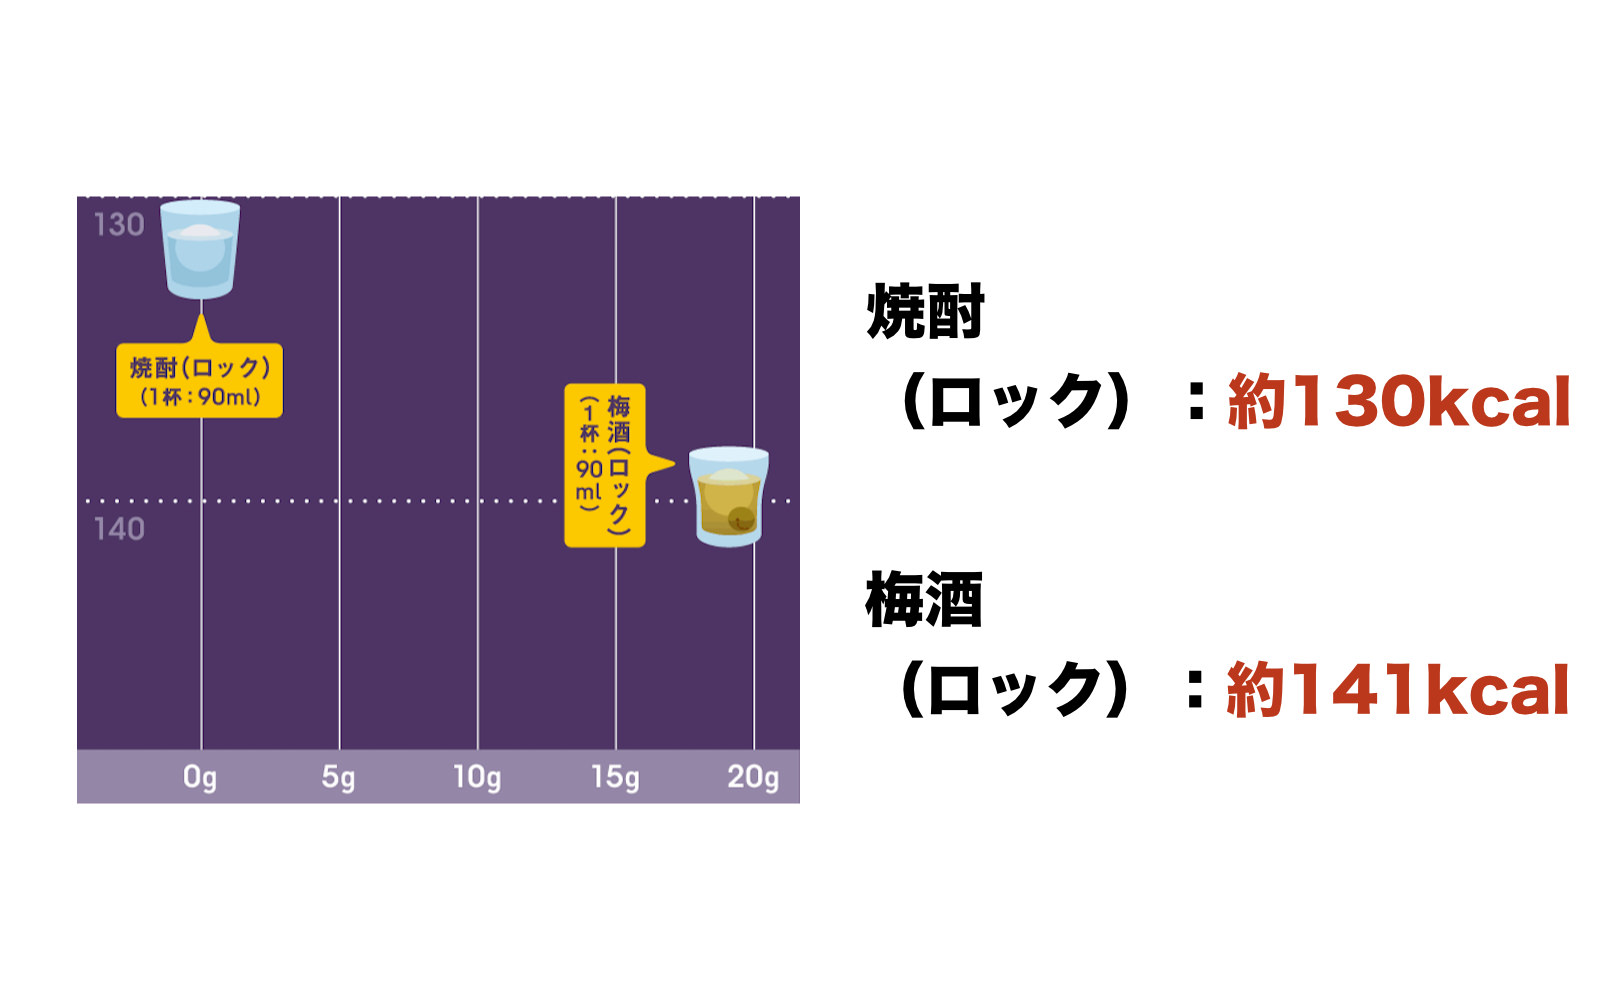 alcohol-calories-ranking-04